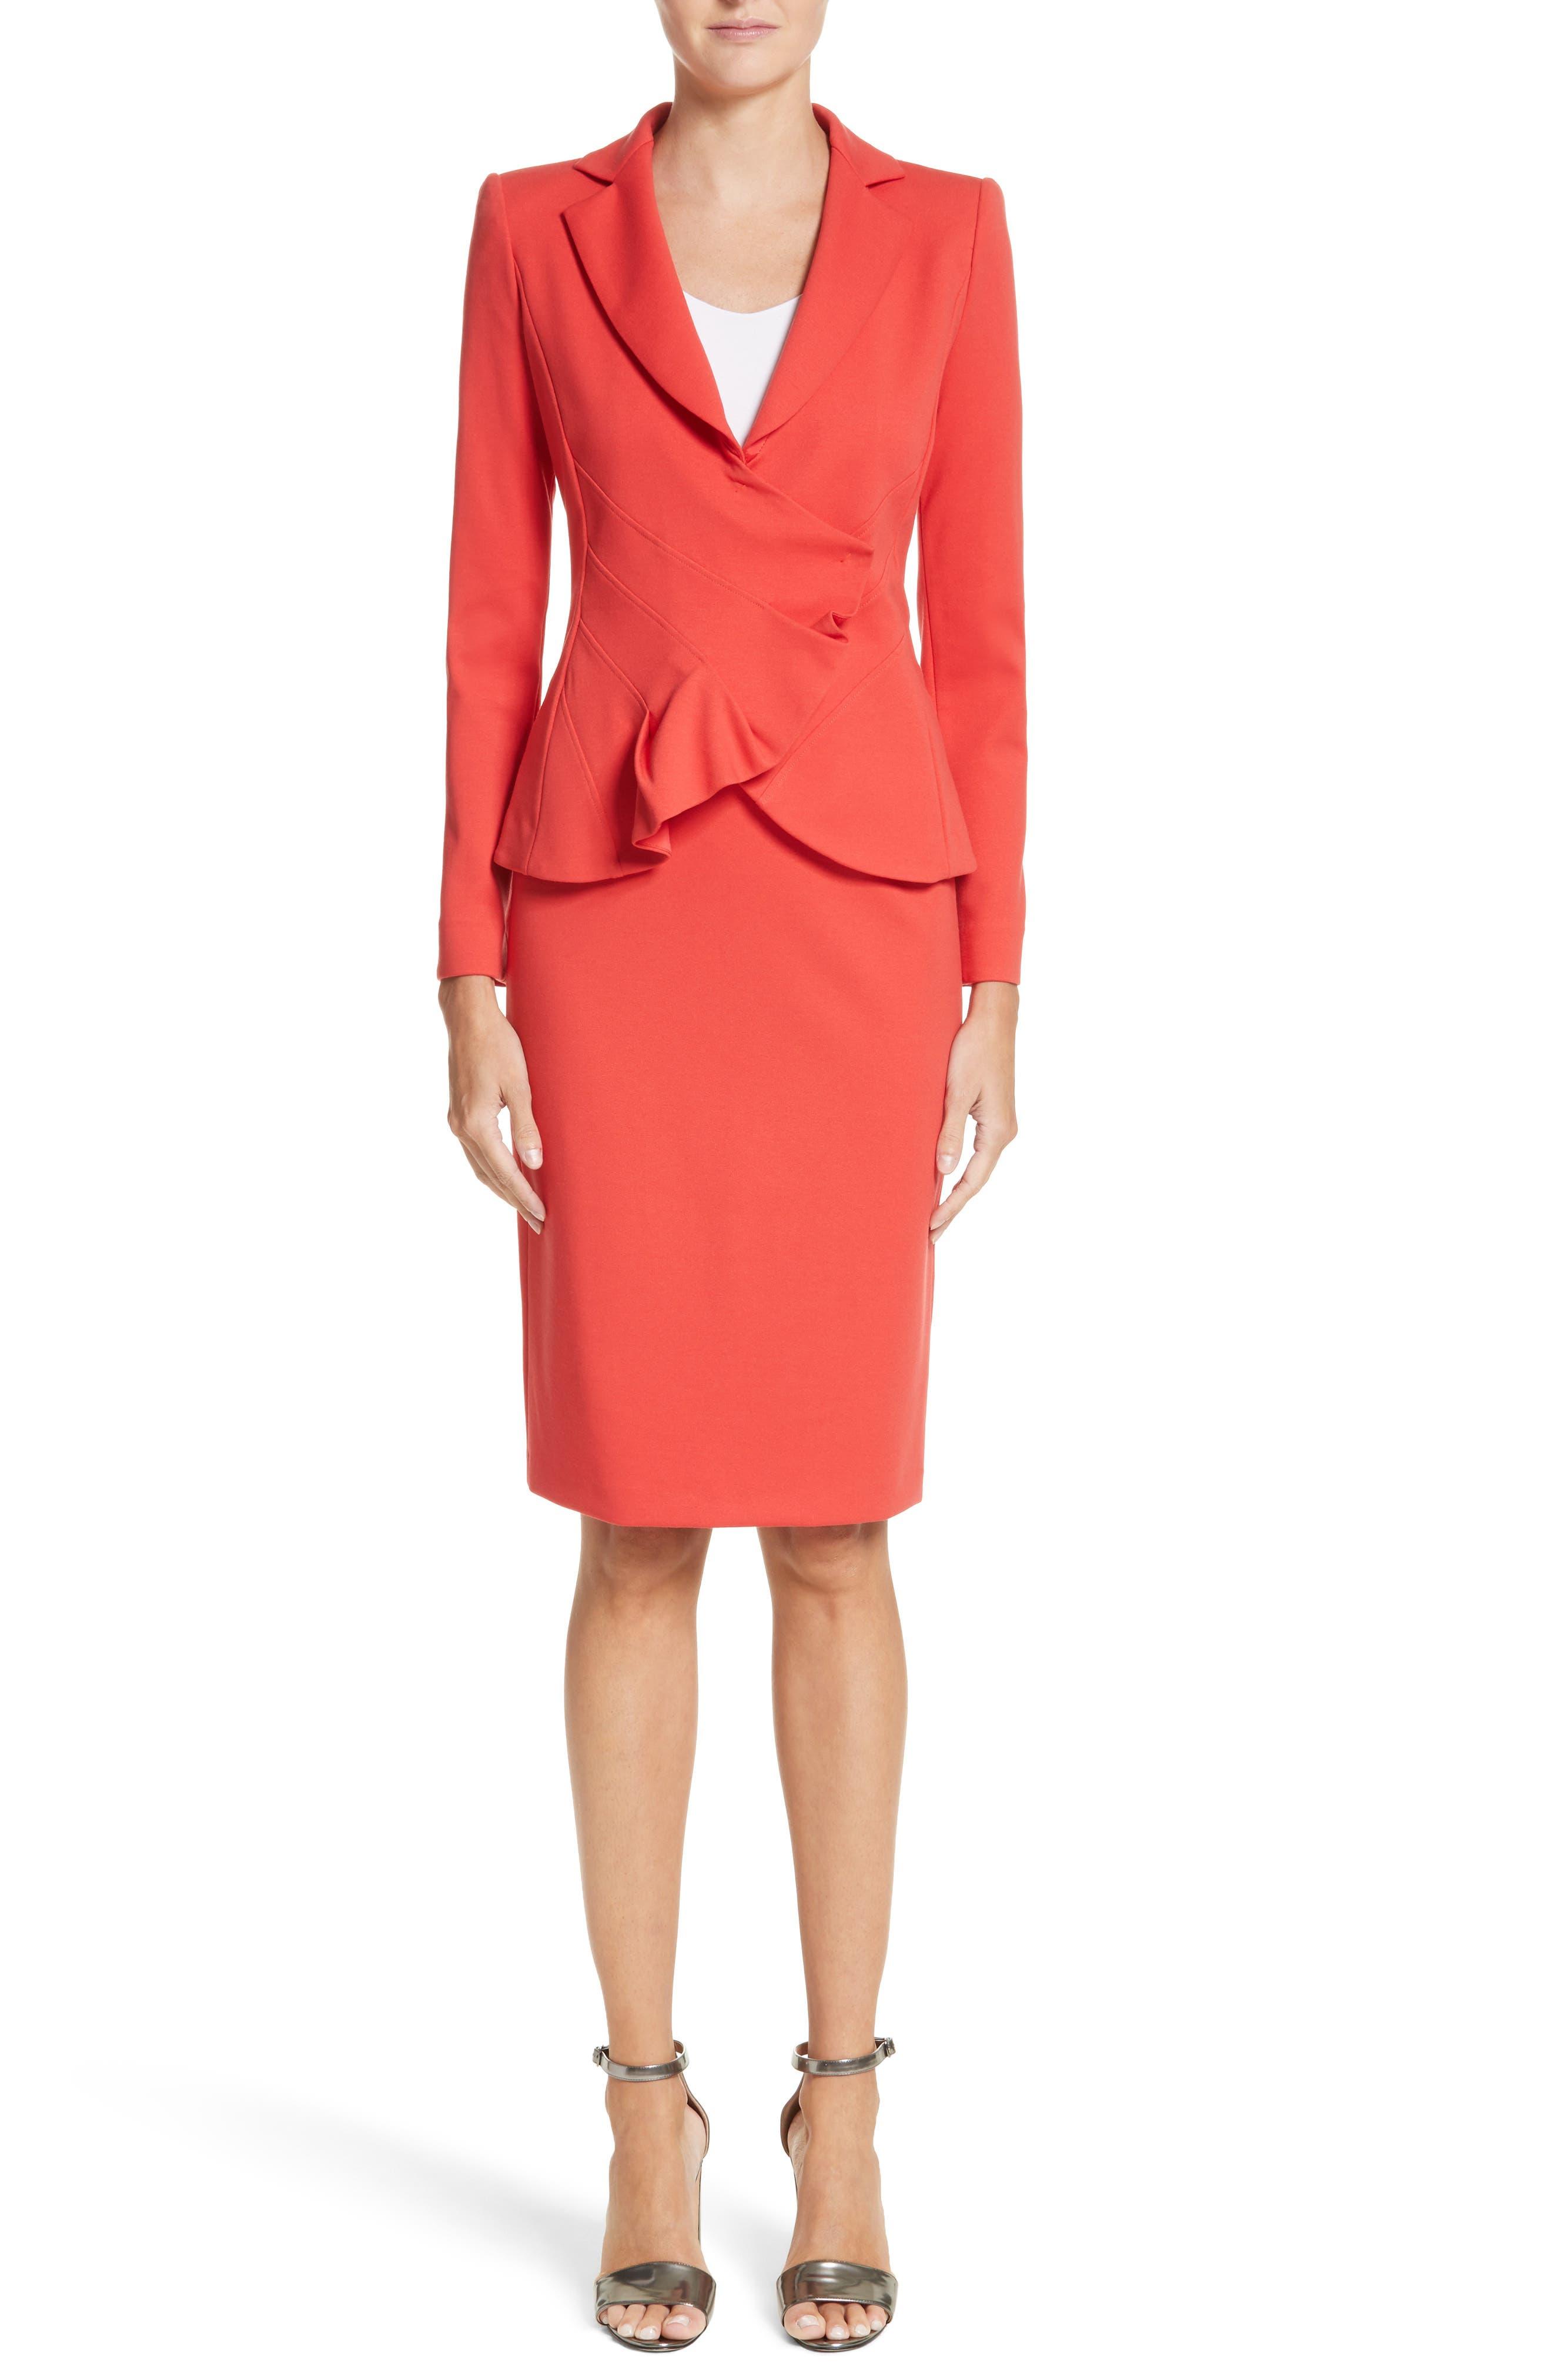 Milano Jersey Pencil Skirt,                             Alternate thumbnail 8, color,                             Solid Bright Orange